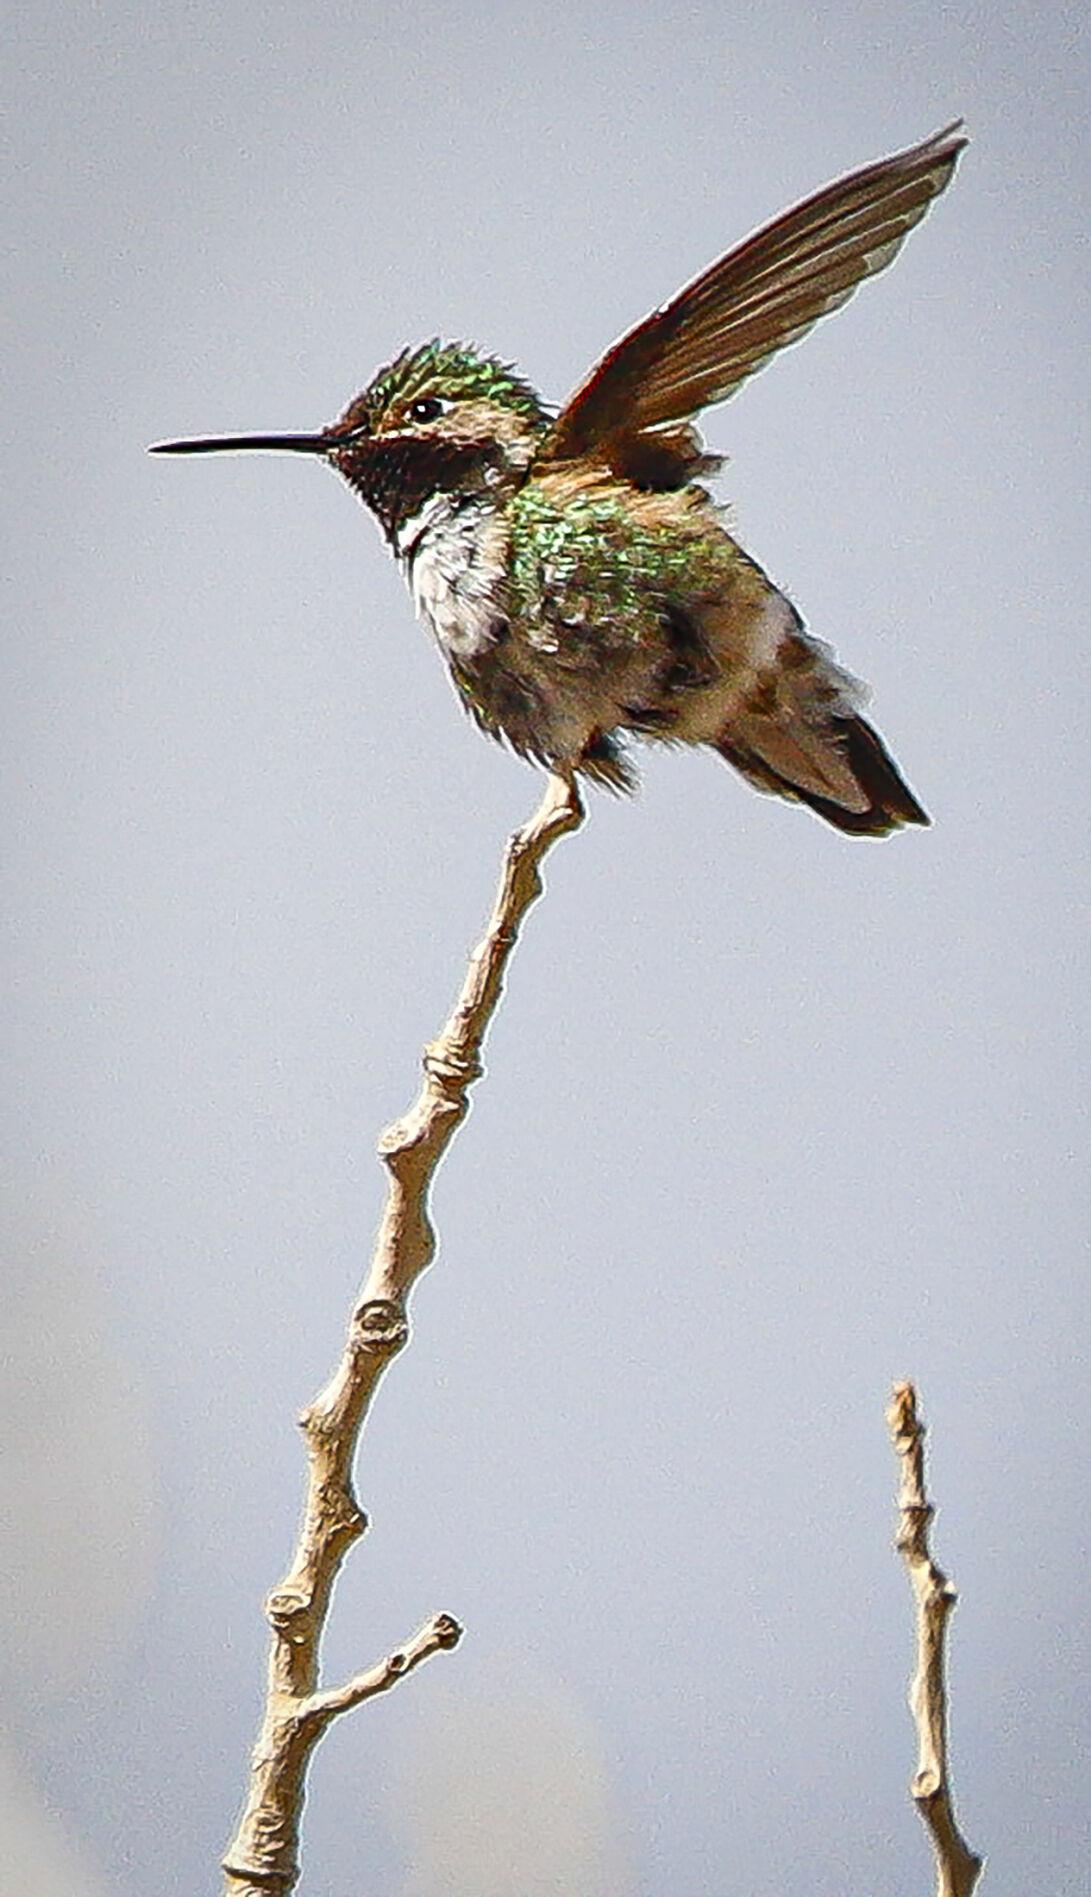 043021_Hummingbird04-rgb_secondary.jpg